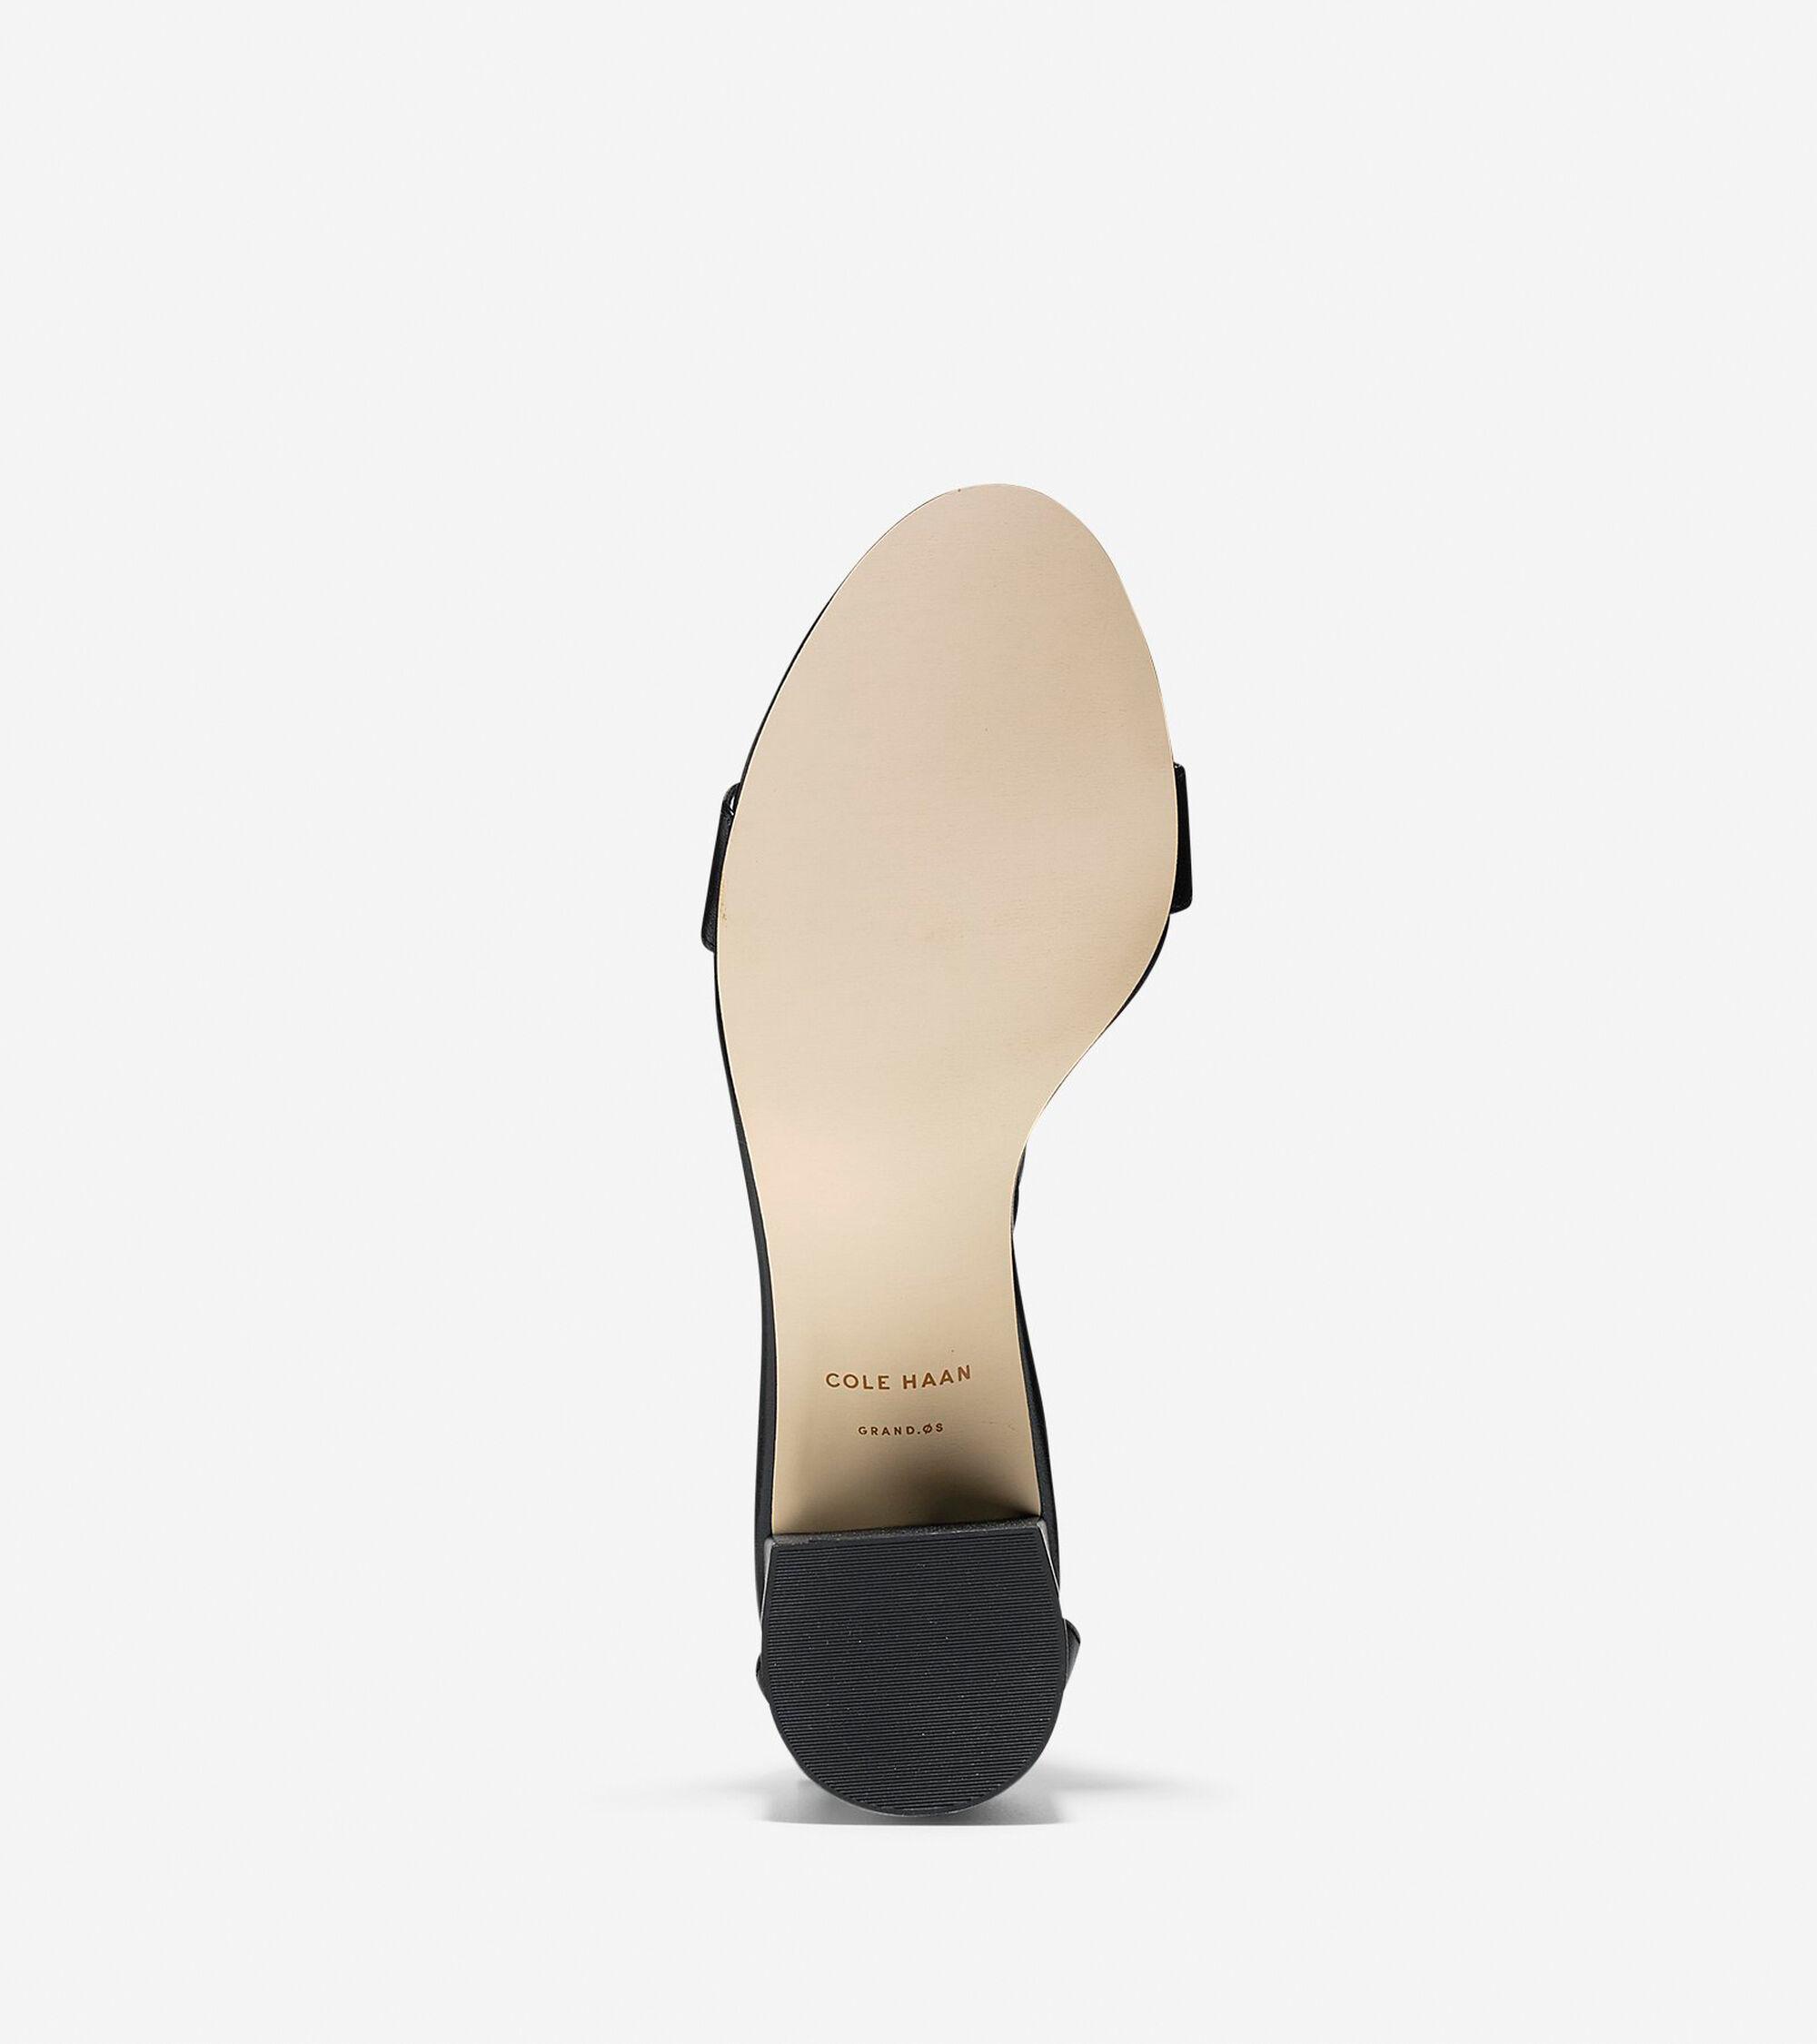 1042912b8d4 Women s Clarette Sandals 65mm in Black Leather